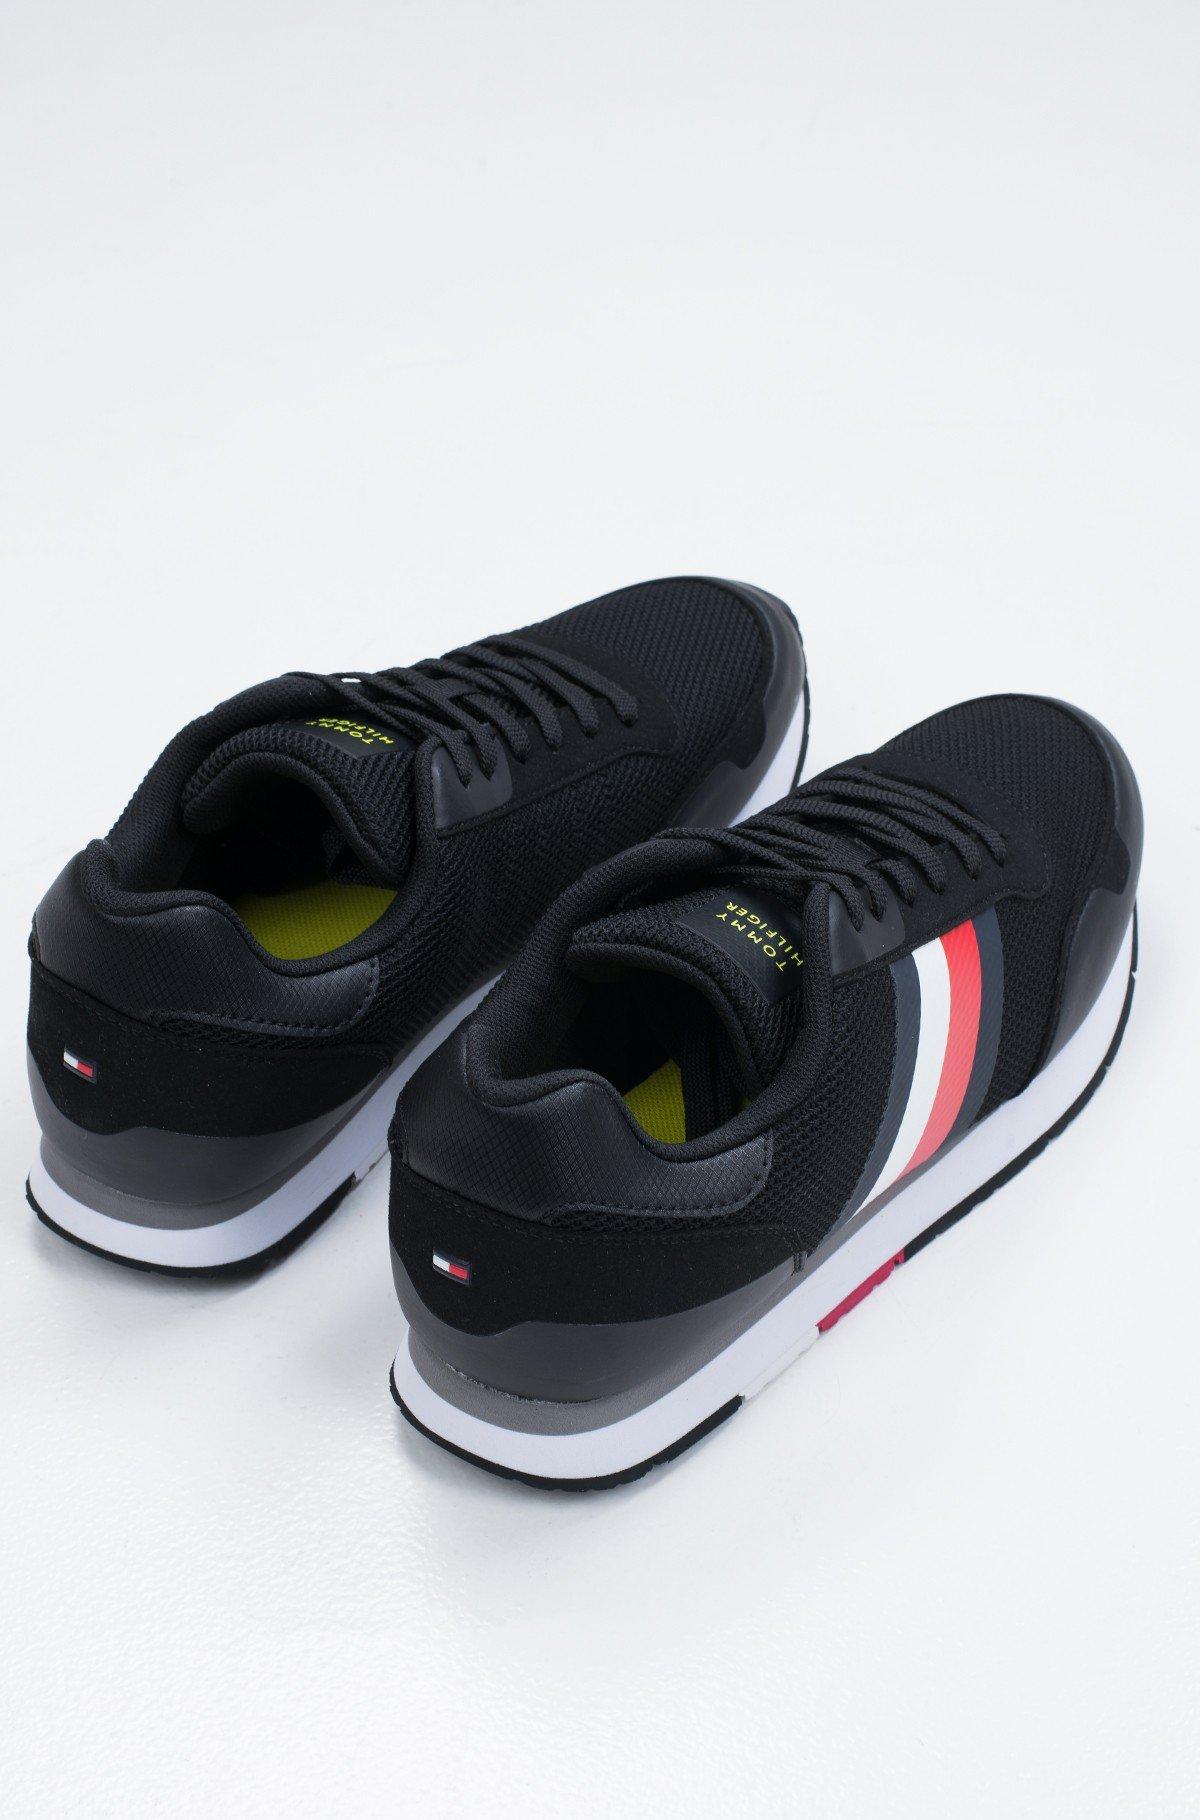 Sportiniai drabužiai CORPORATE MATERIAL MIX RUNNER-full-1